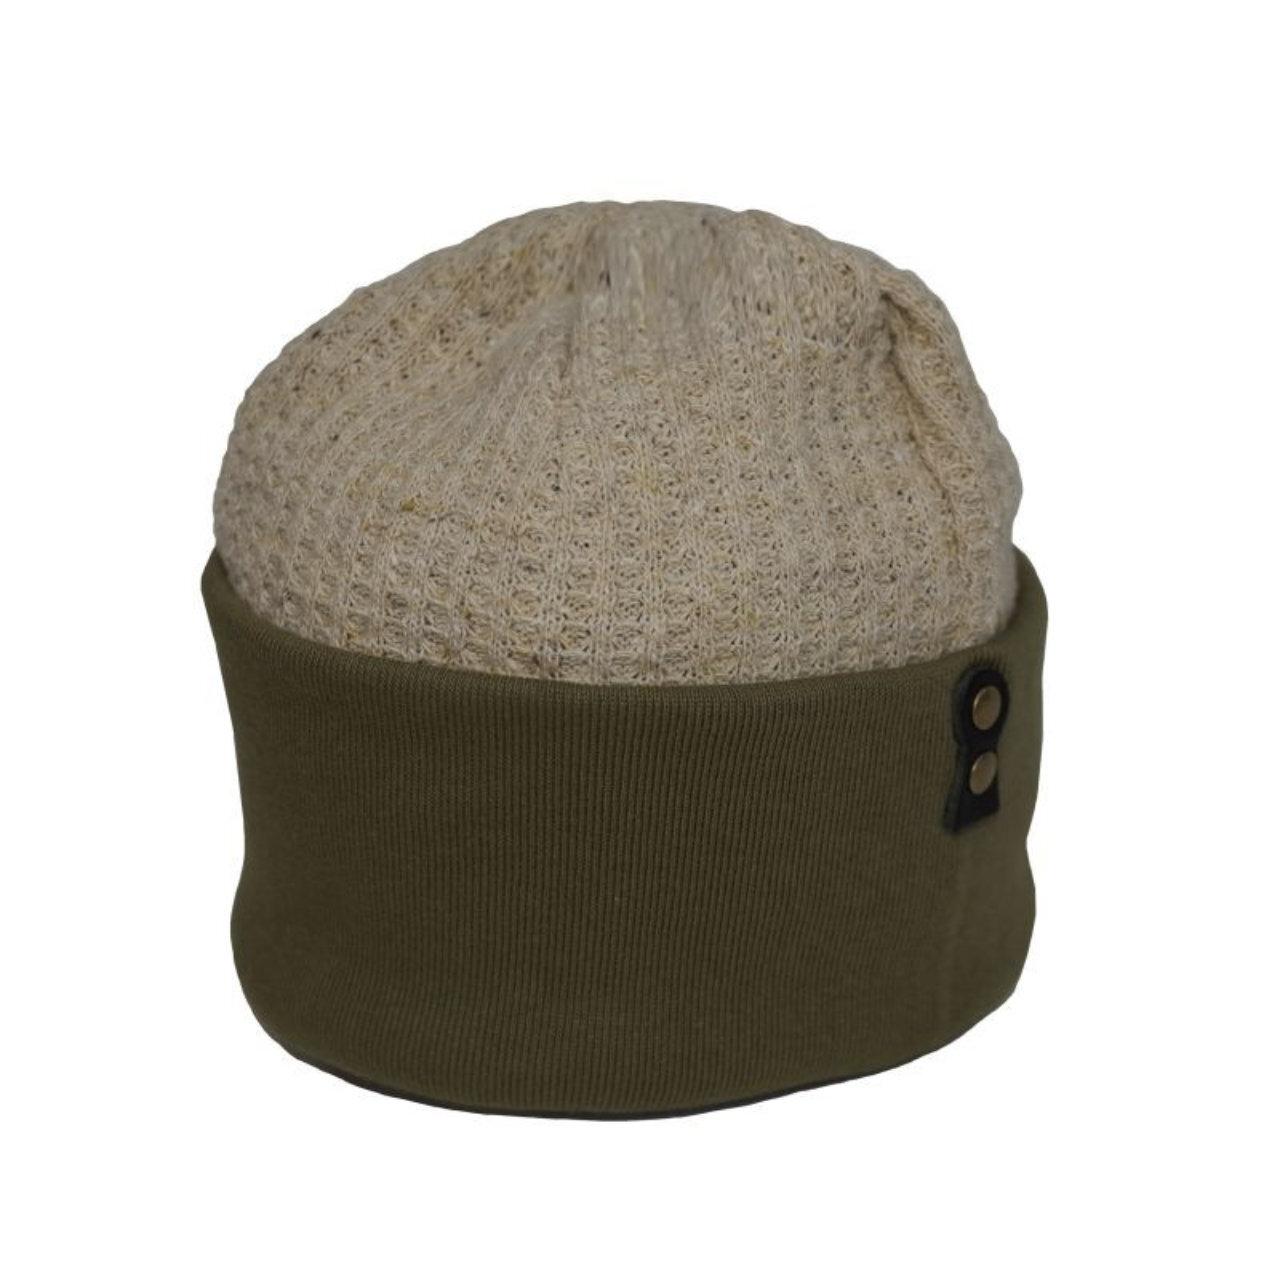 Original John | KNIT CAP - Olive/Beige [HTB381]